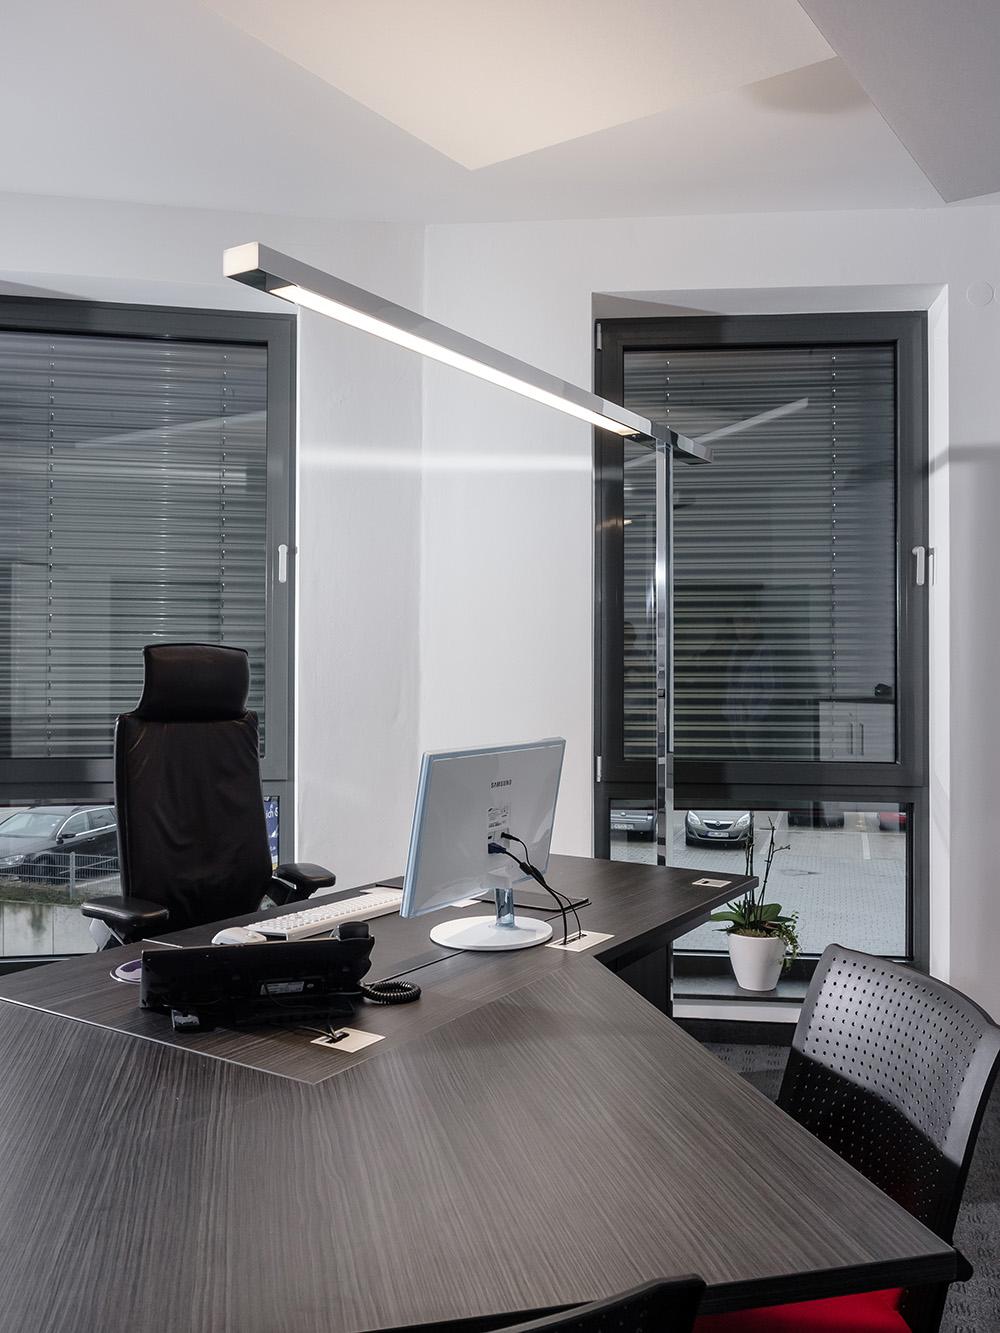 b ro emb leuchten. Black Bedroom Furniture Sets. Home Design Ideas